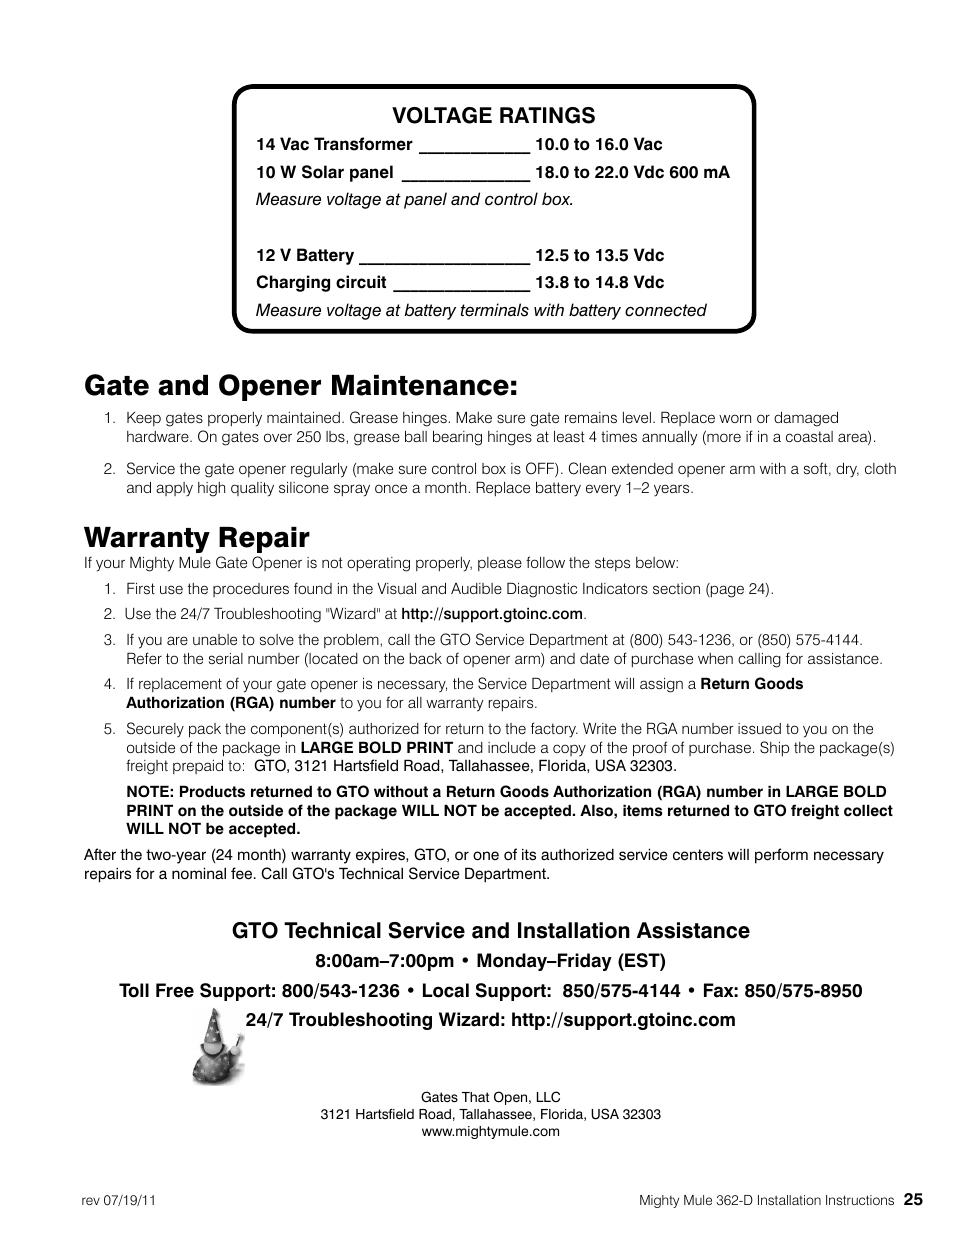 Gate And Opener Maintenance Warranty Repair Voltage